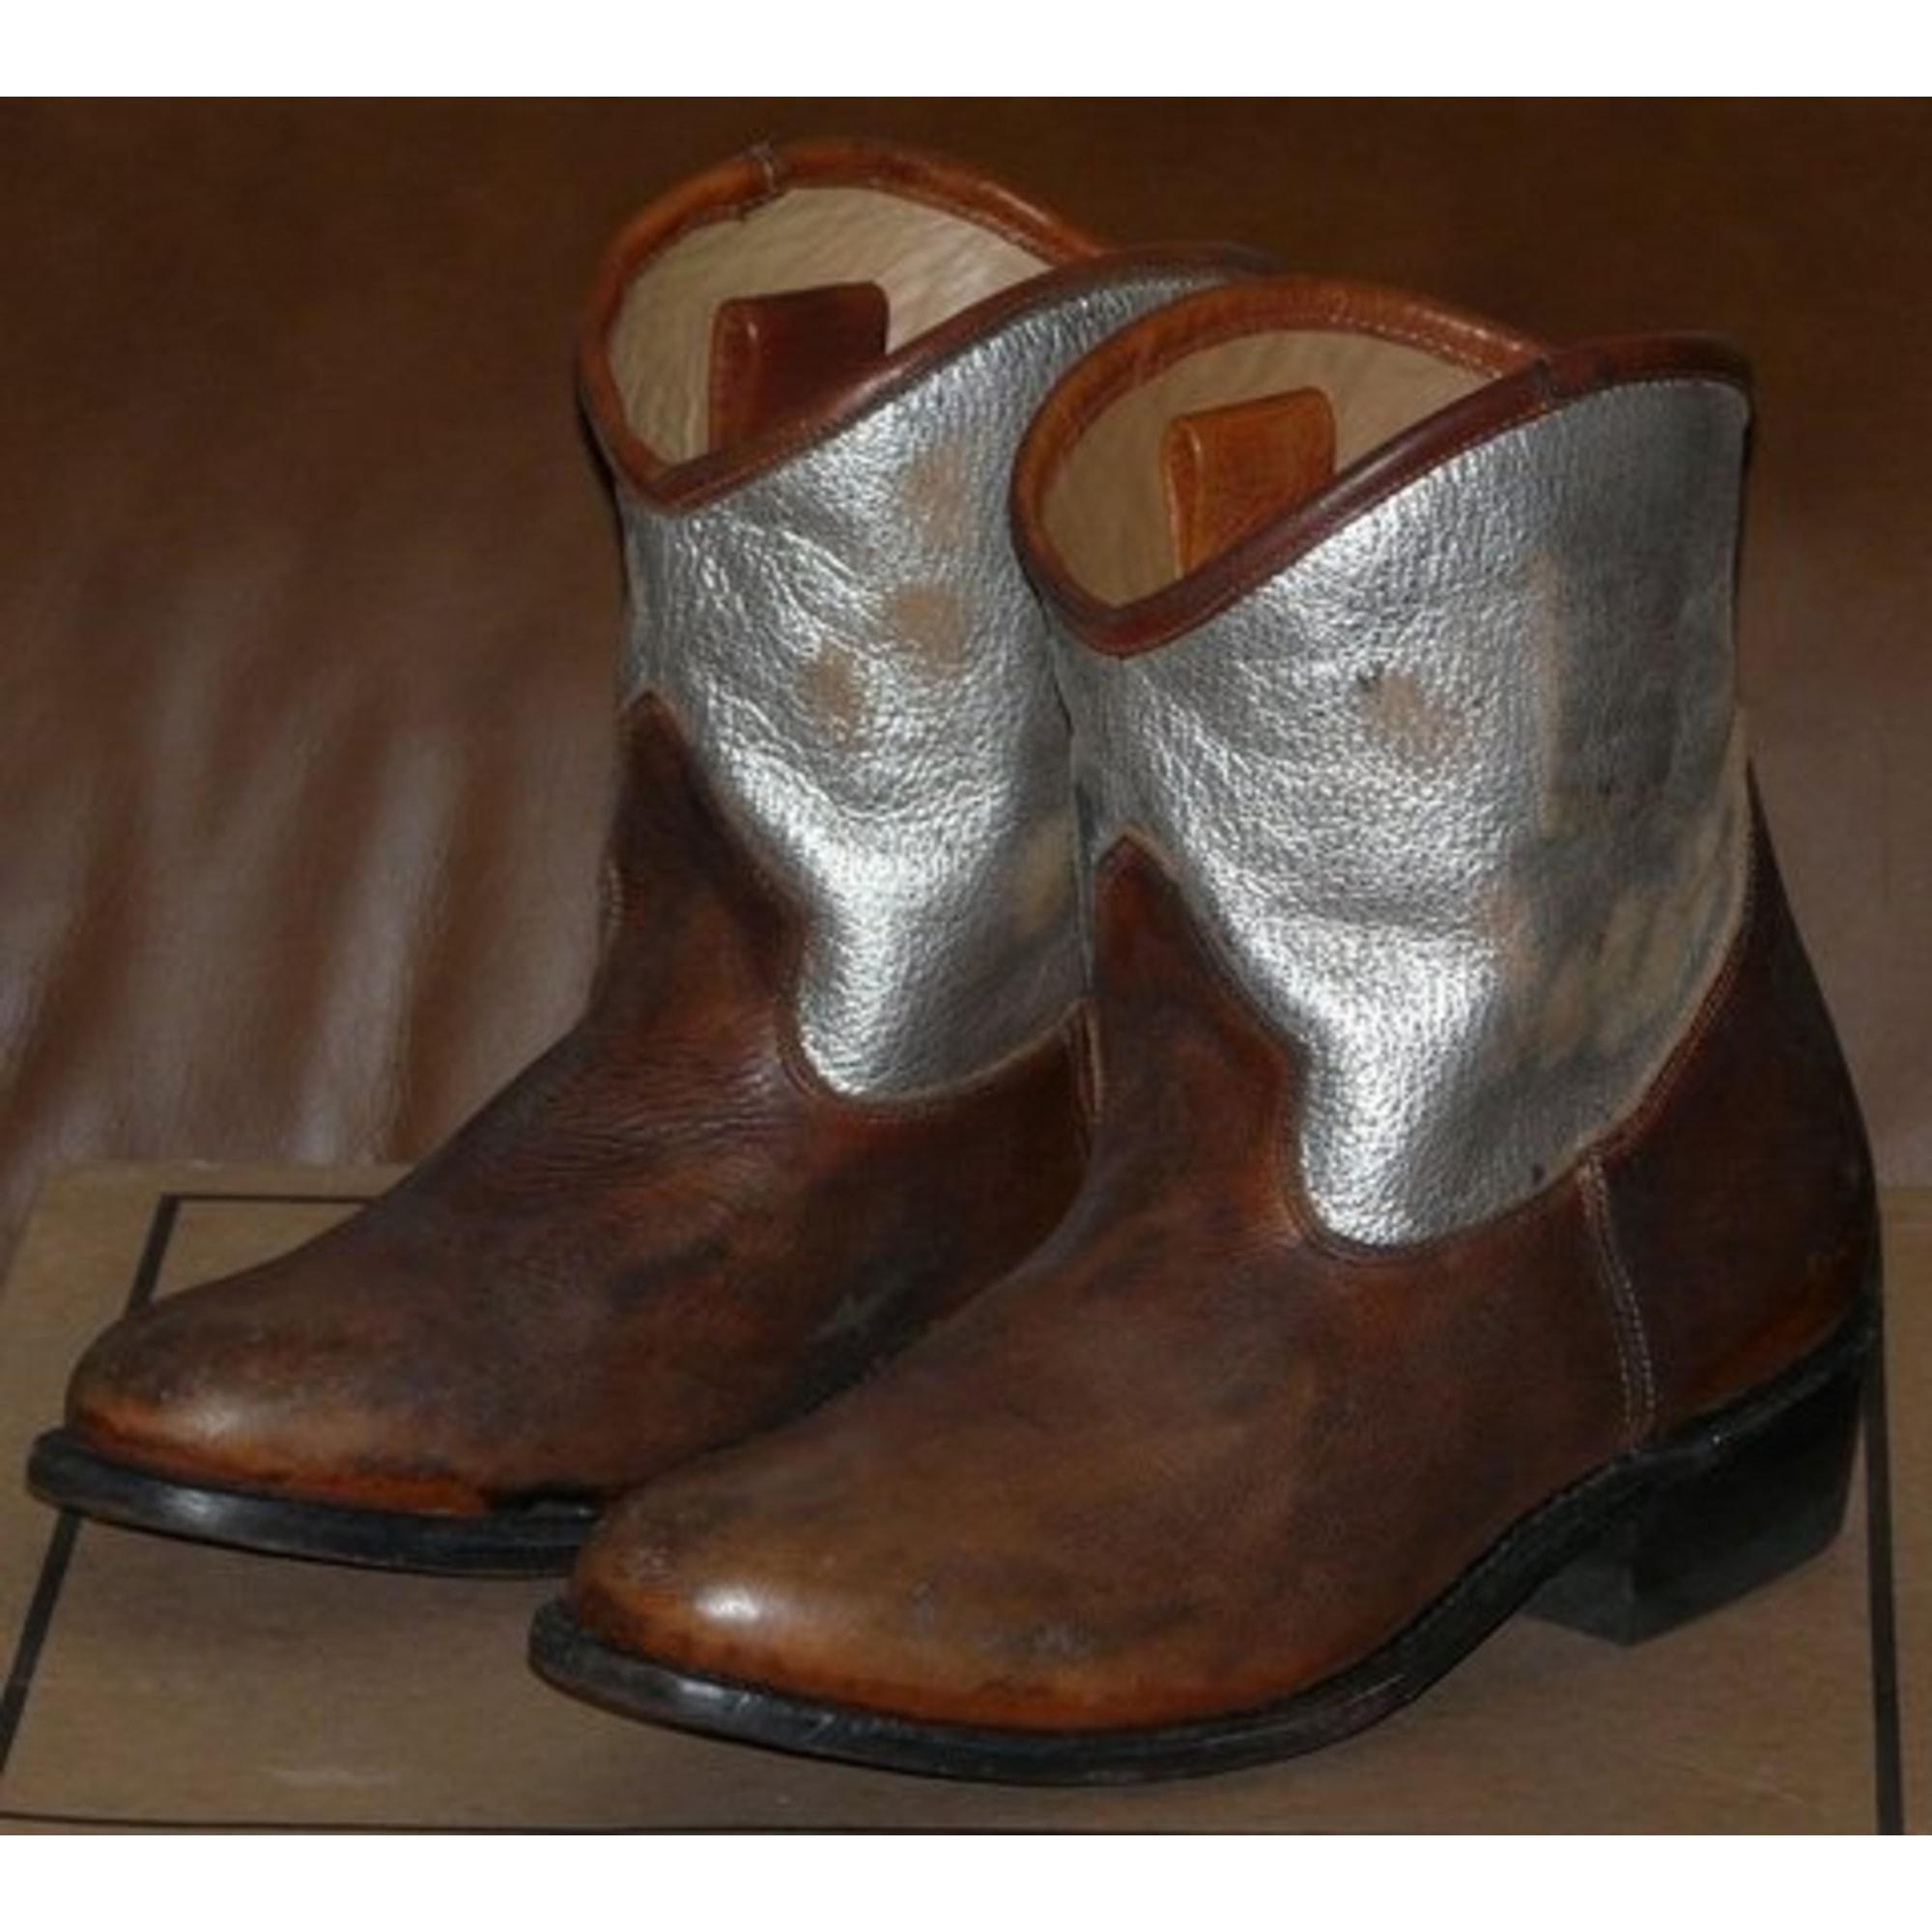 sports shoes cb55c 624d5 Stivali a punta, stivaletti, stivali bassi cowboy ASH